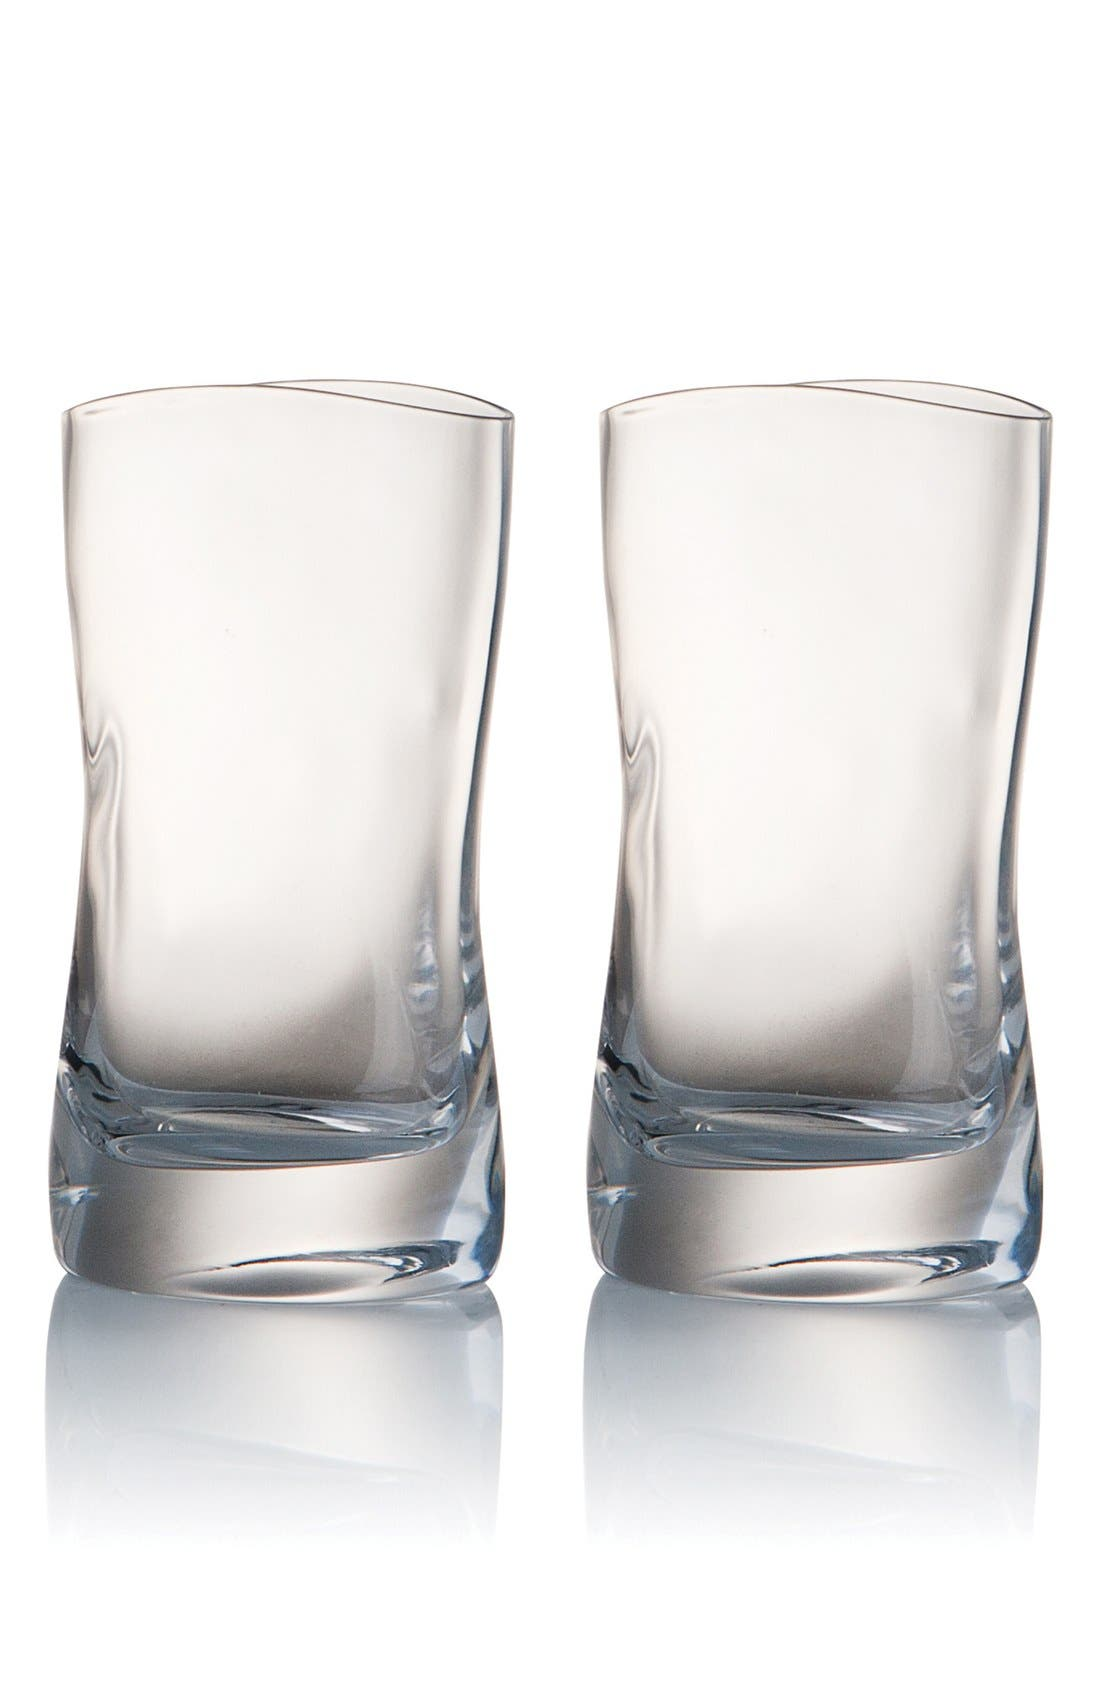 Main Image - Nambé 'River' Highball Glasses (Set of 2)